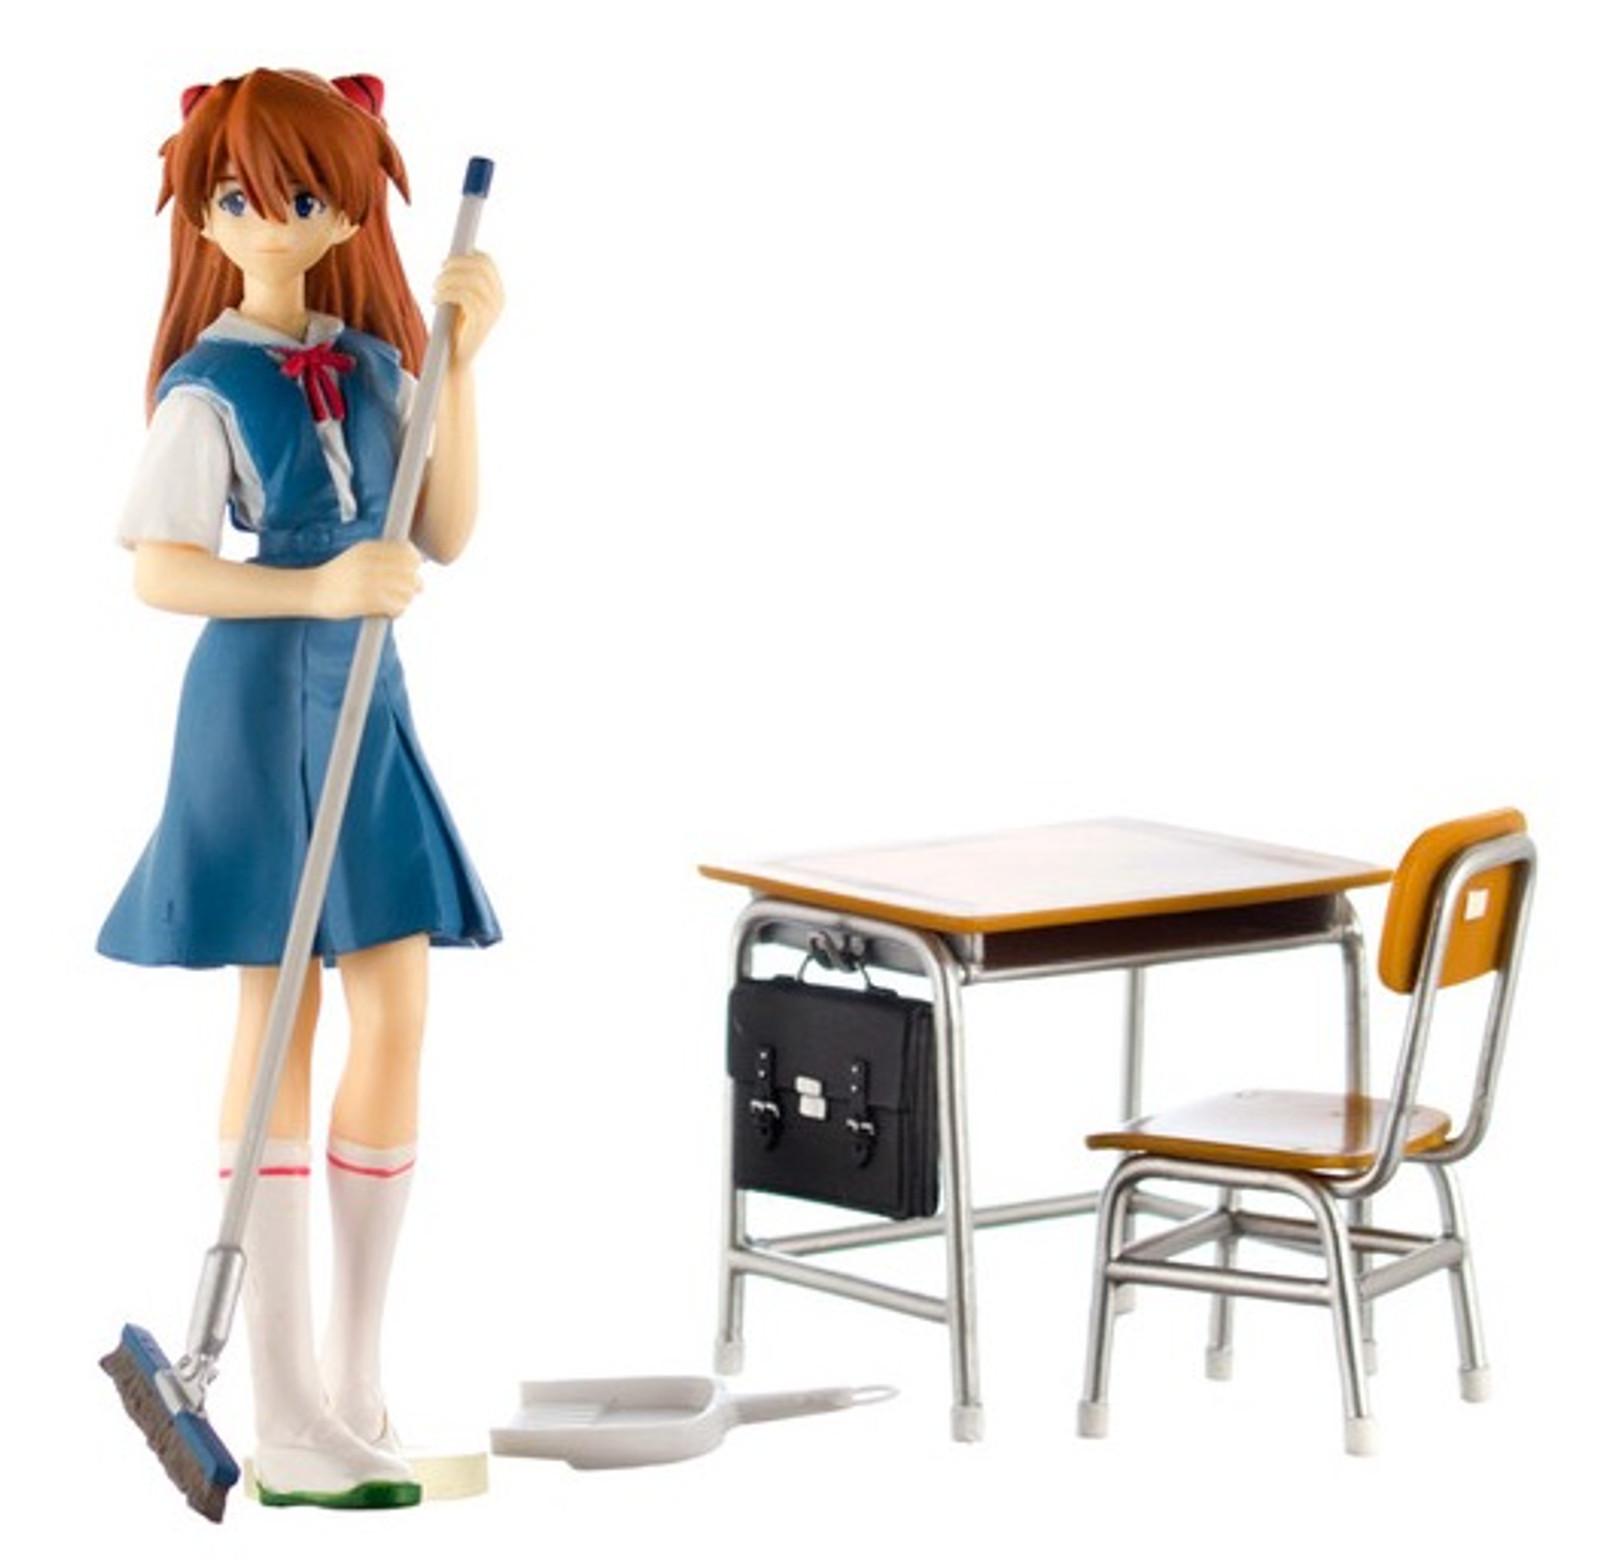 Evangelion Asuka Langley Cleaning Time Class Room Diorama Figure Set SEGA JAPAN